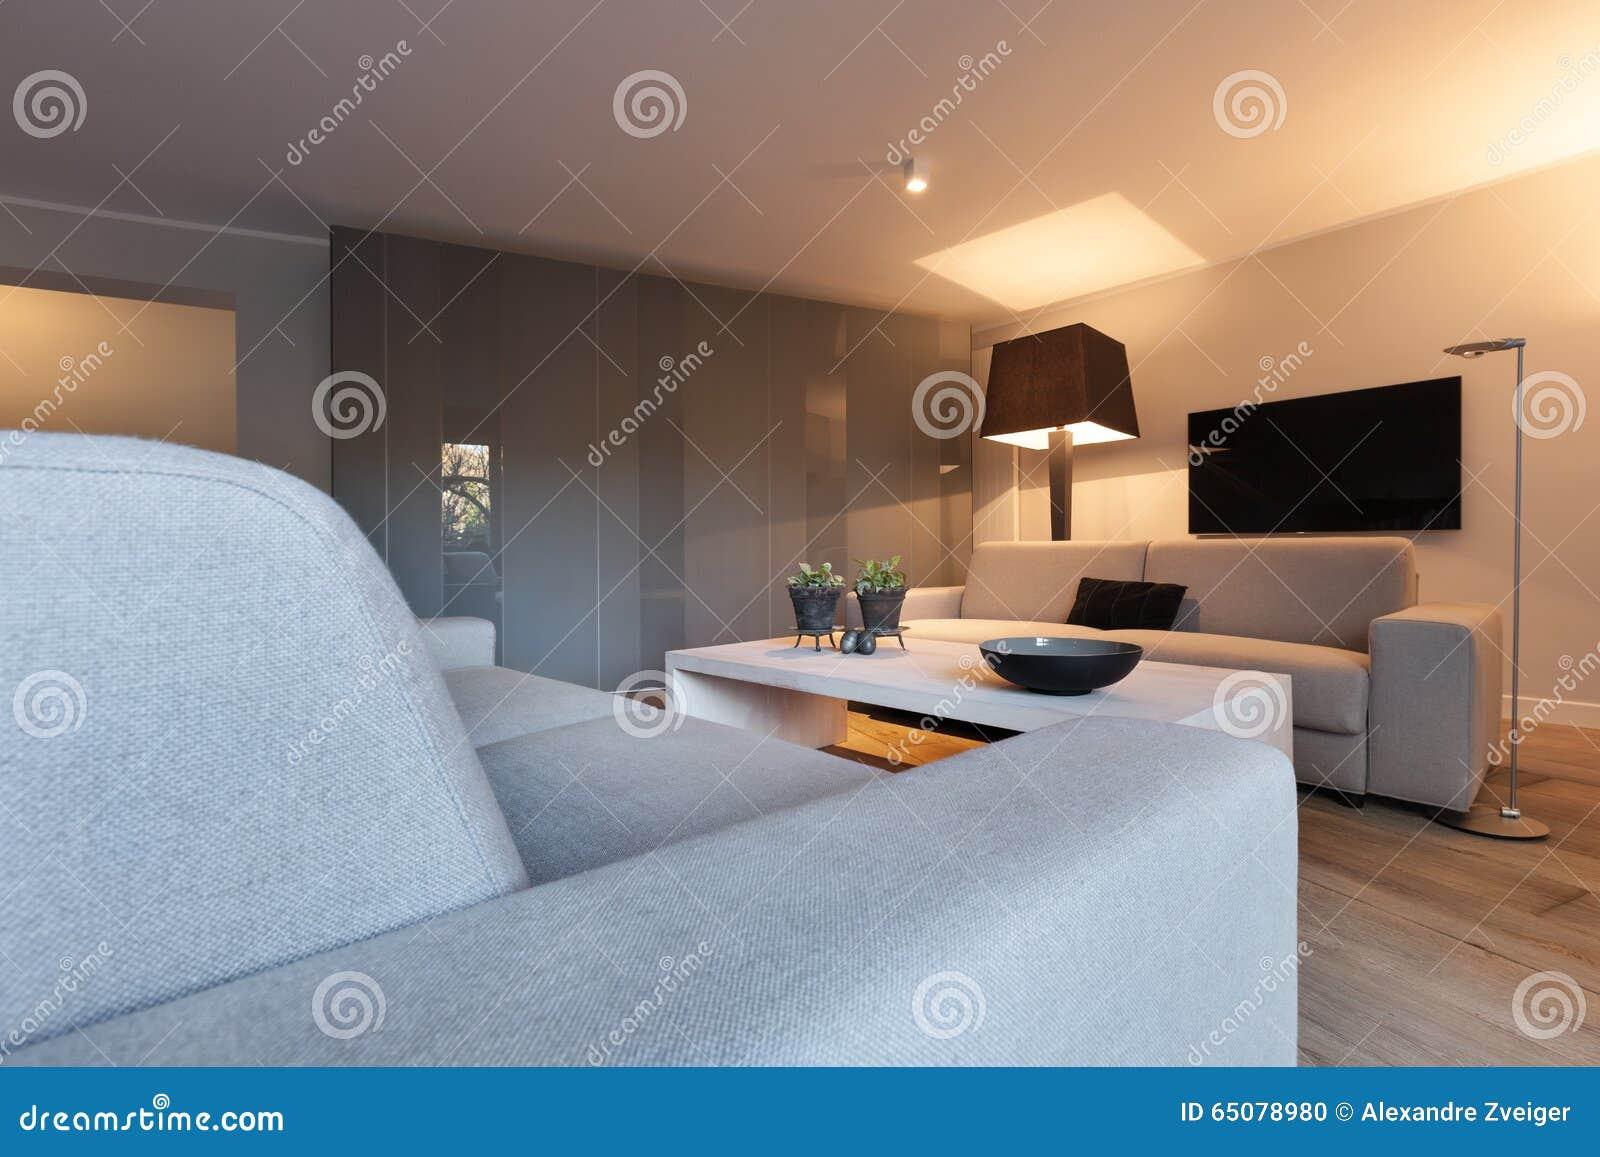 Interior Comfortable Living Room Stock Photo Image 65078980